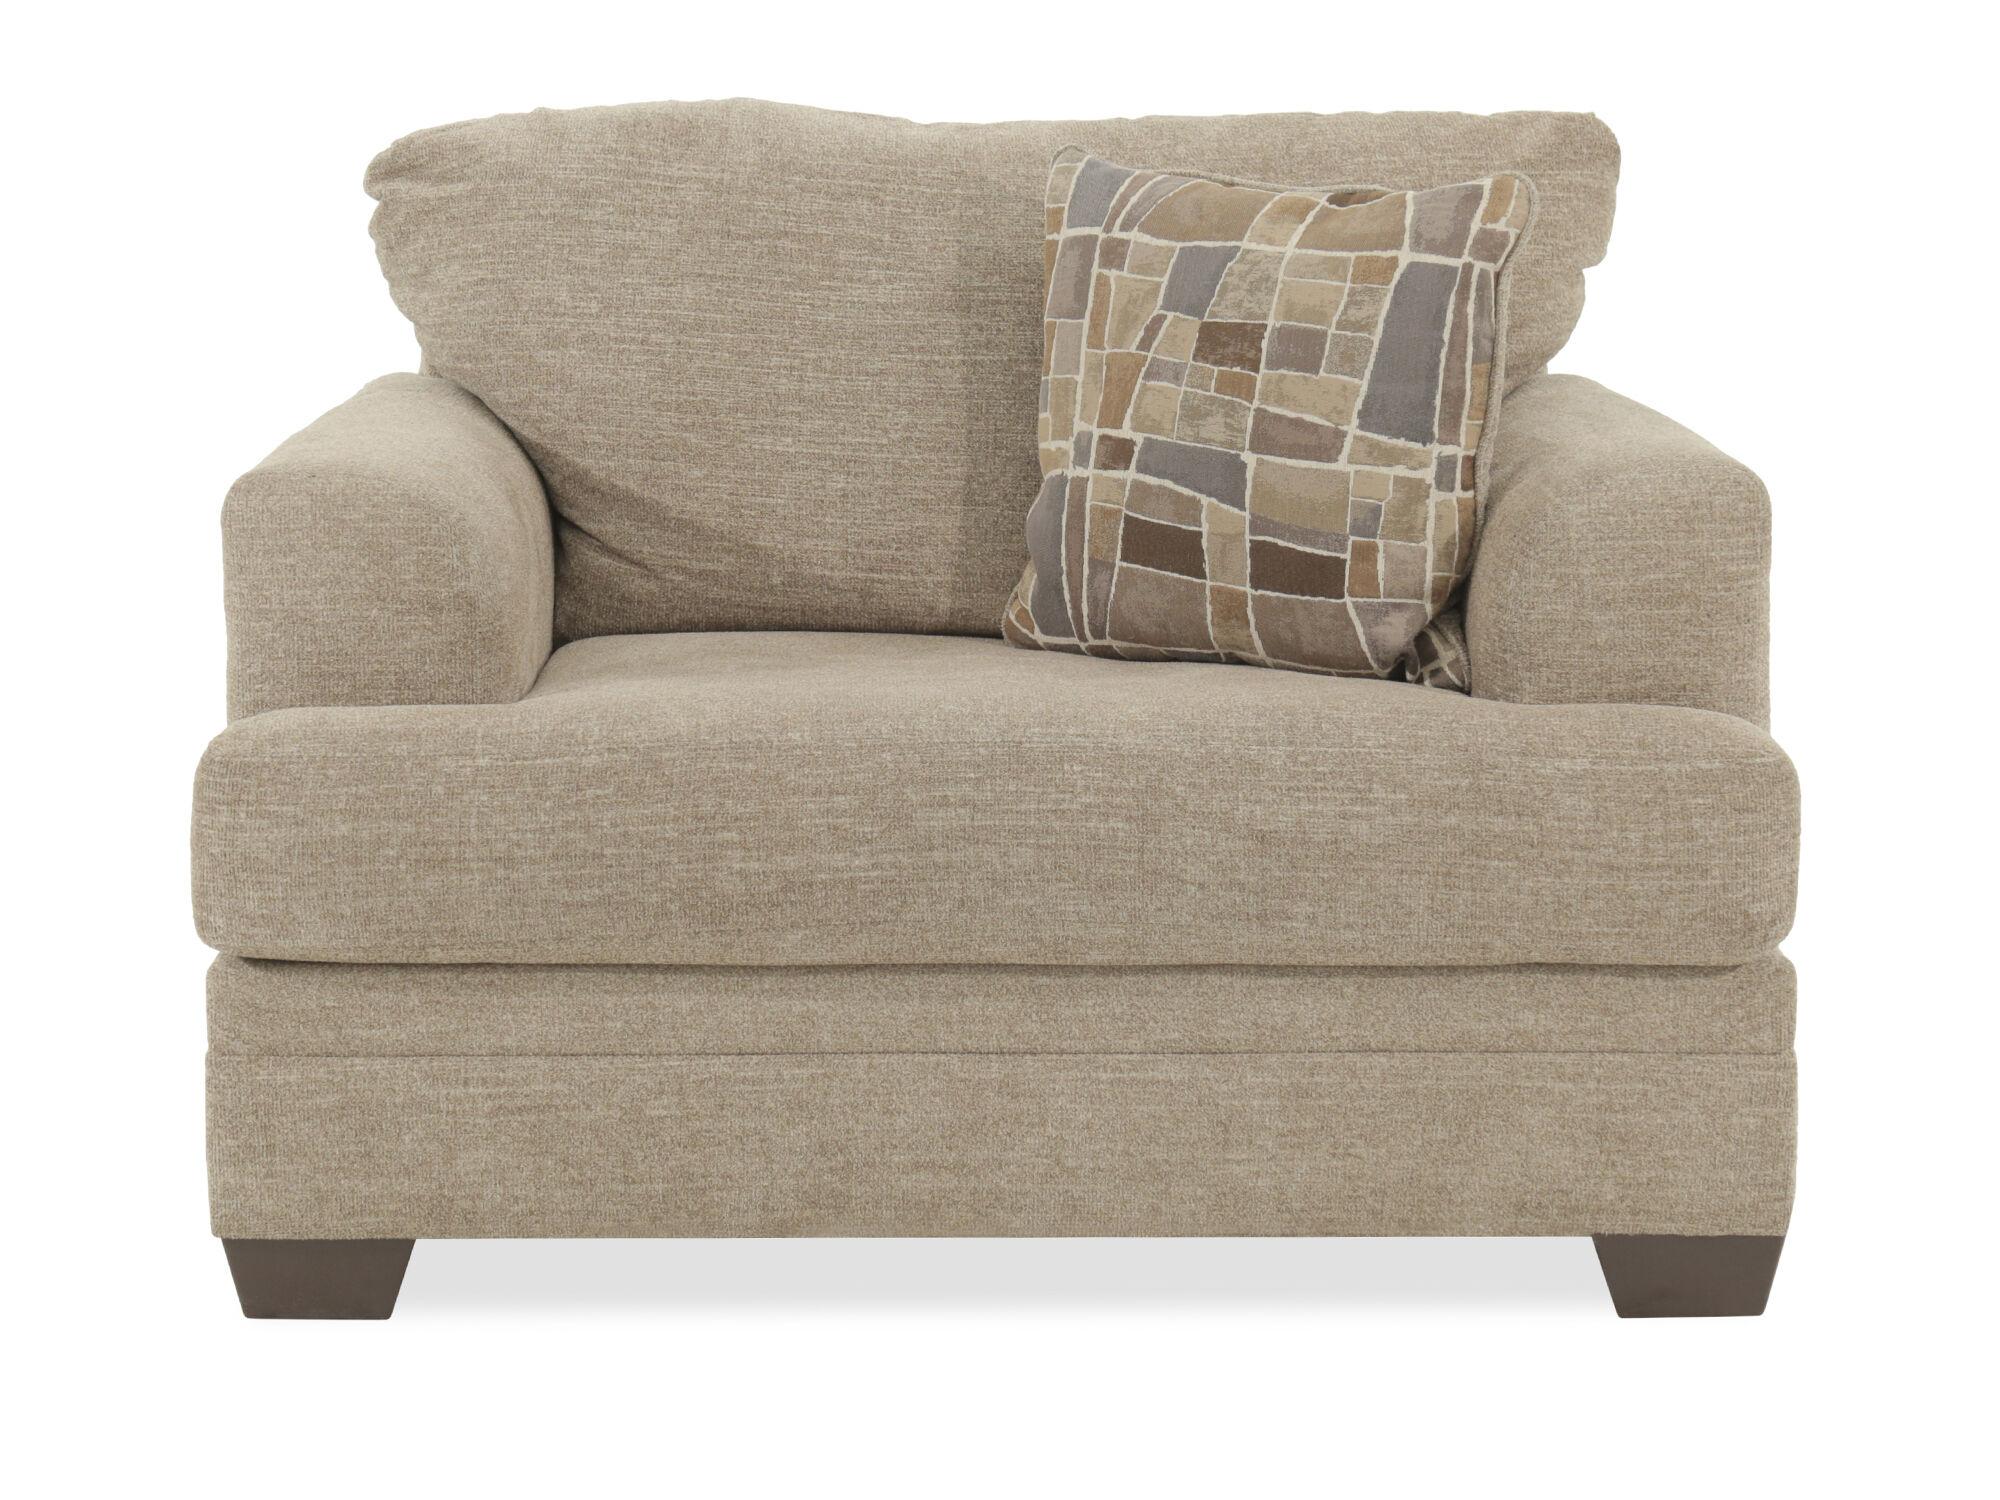 living room chairs waffe parishpress co